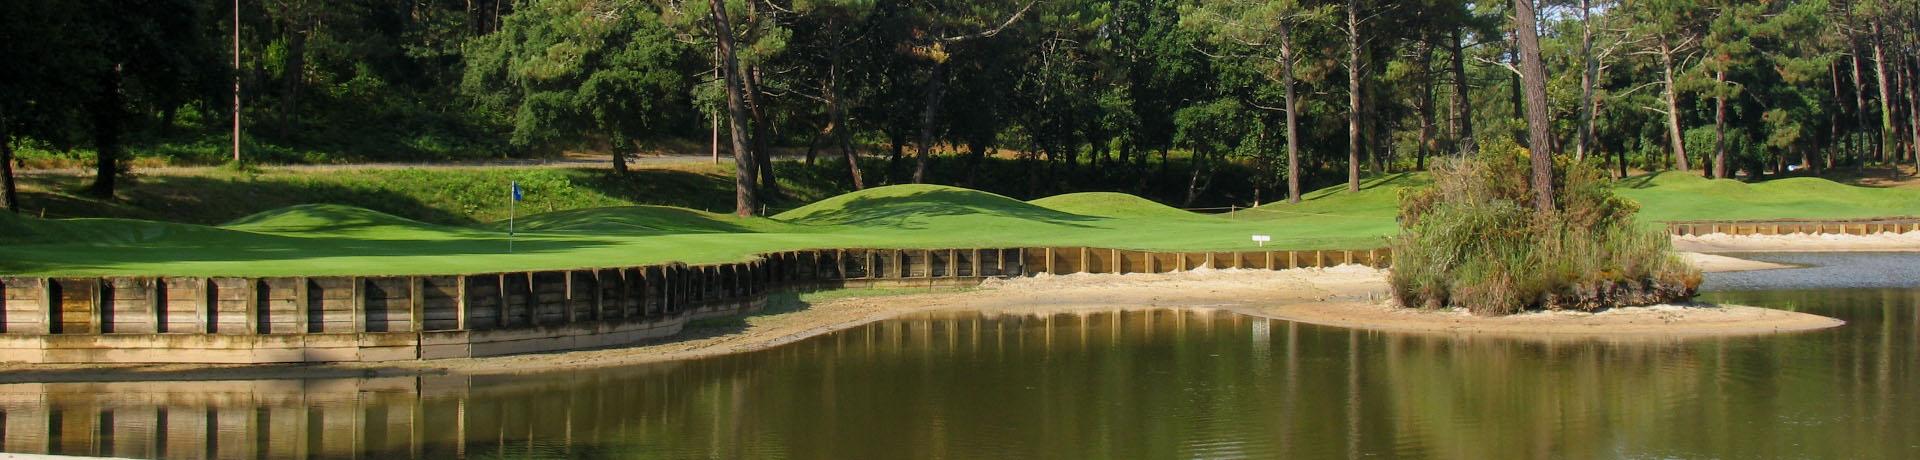 Golf Blue Green Seignosse